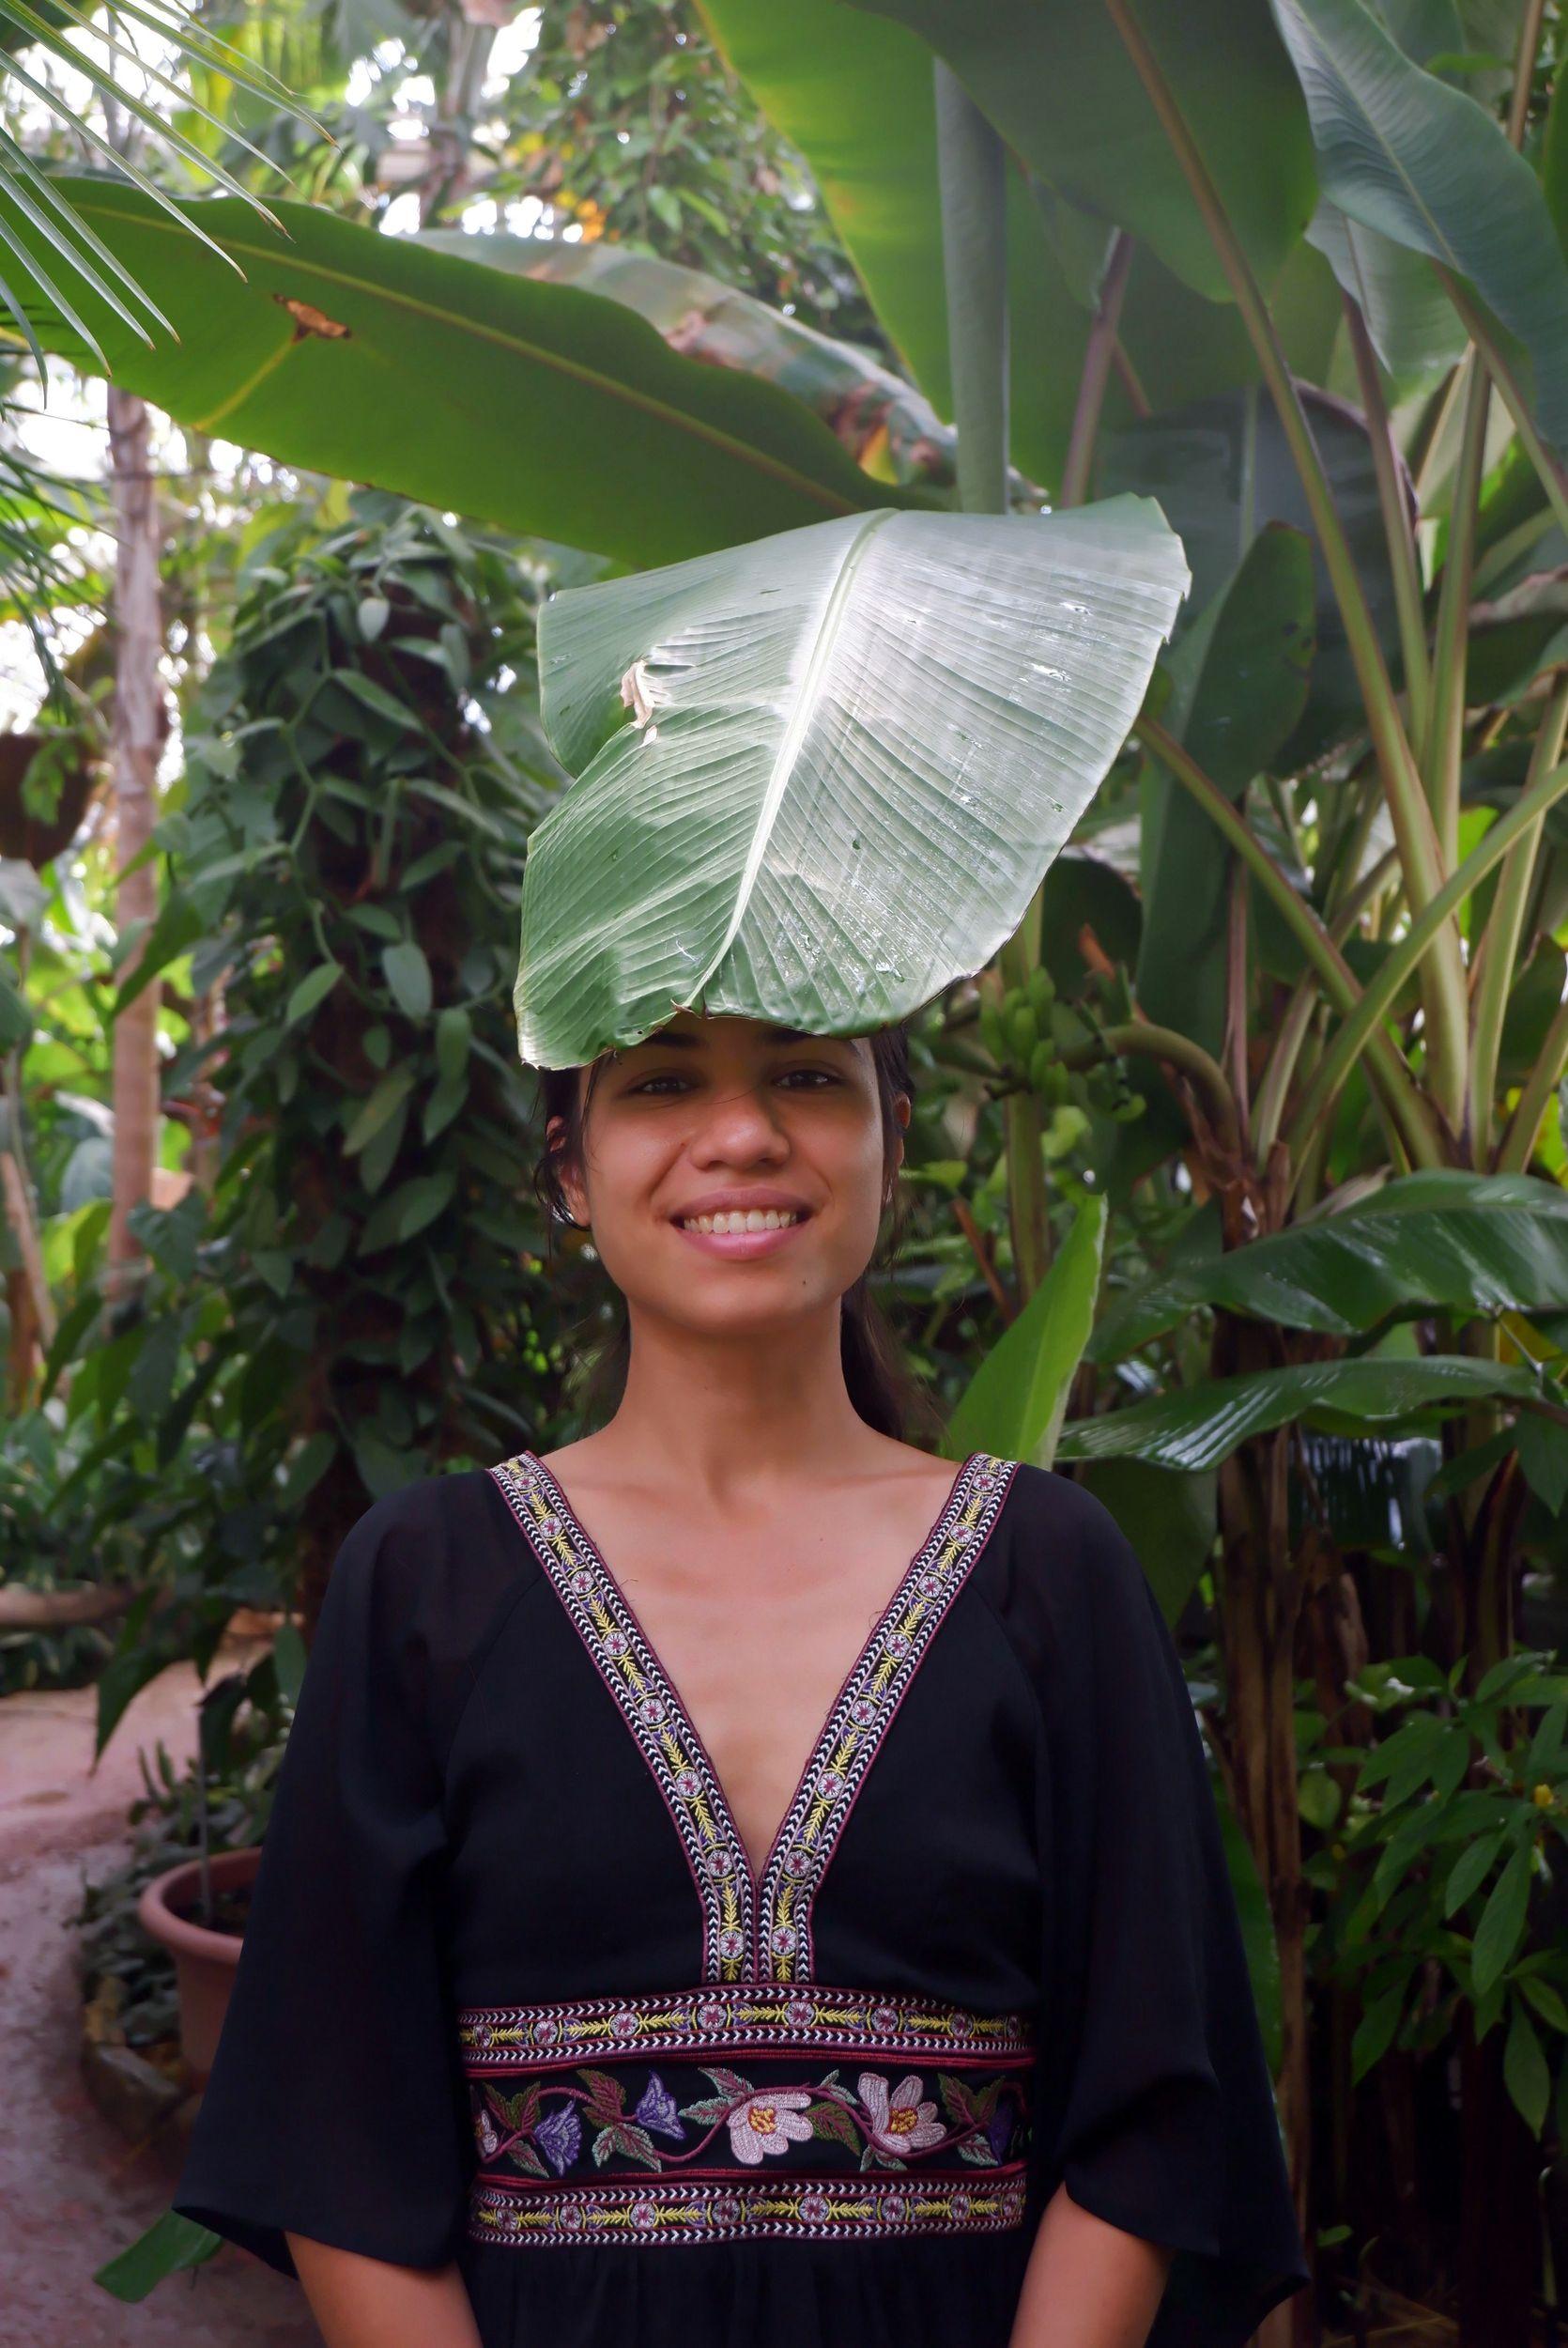 marina et chapeau végétal